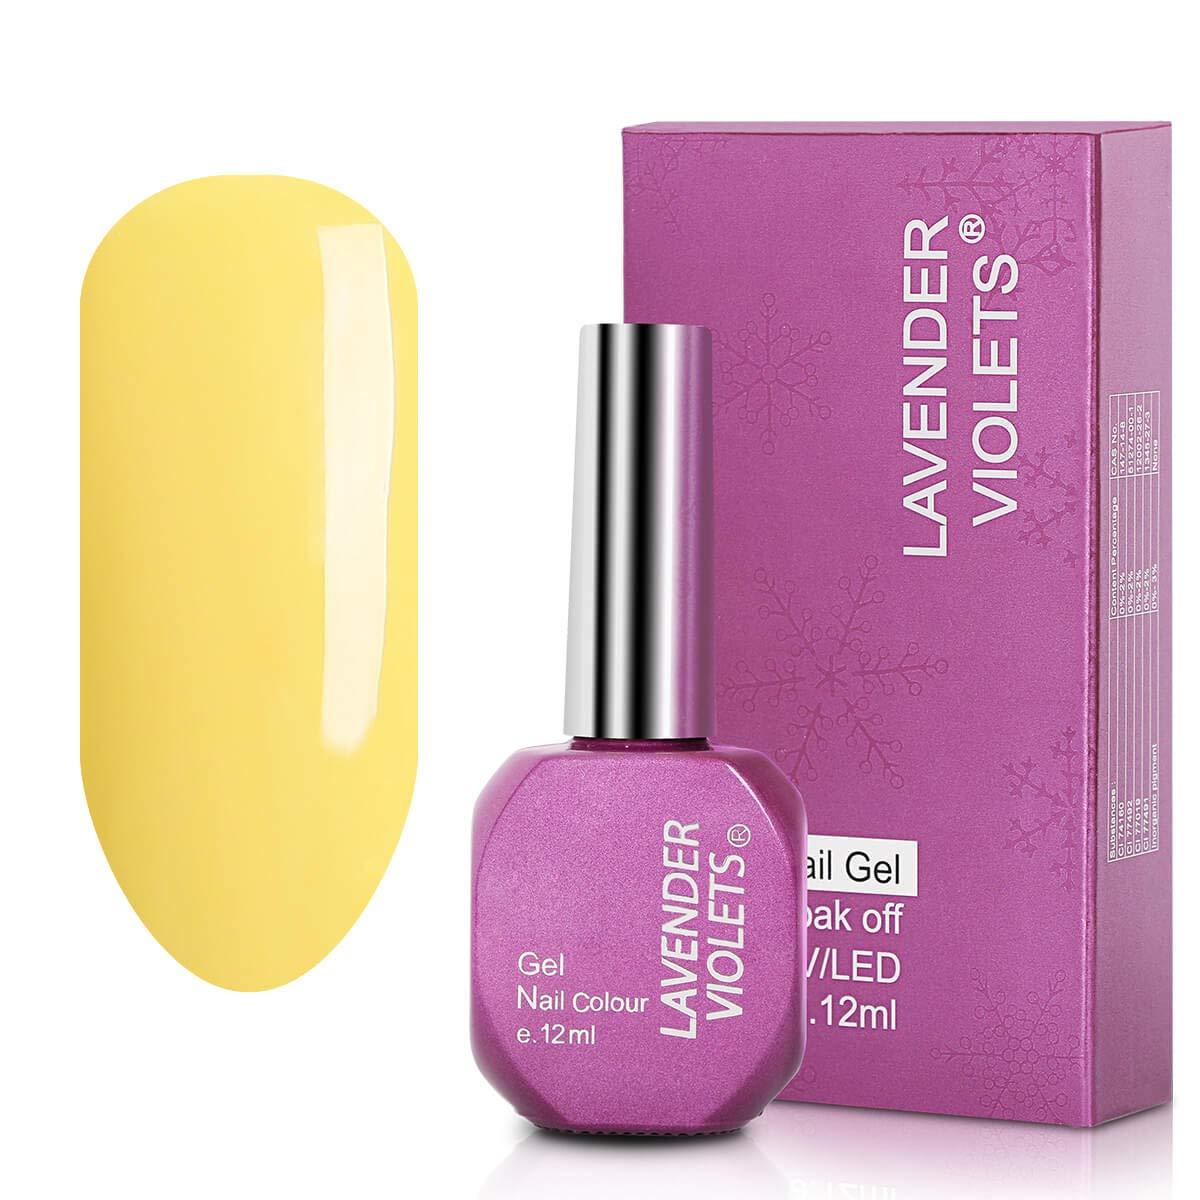 Soak off UV Gel Nail Polish Lacquer 12ml Khaki